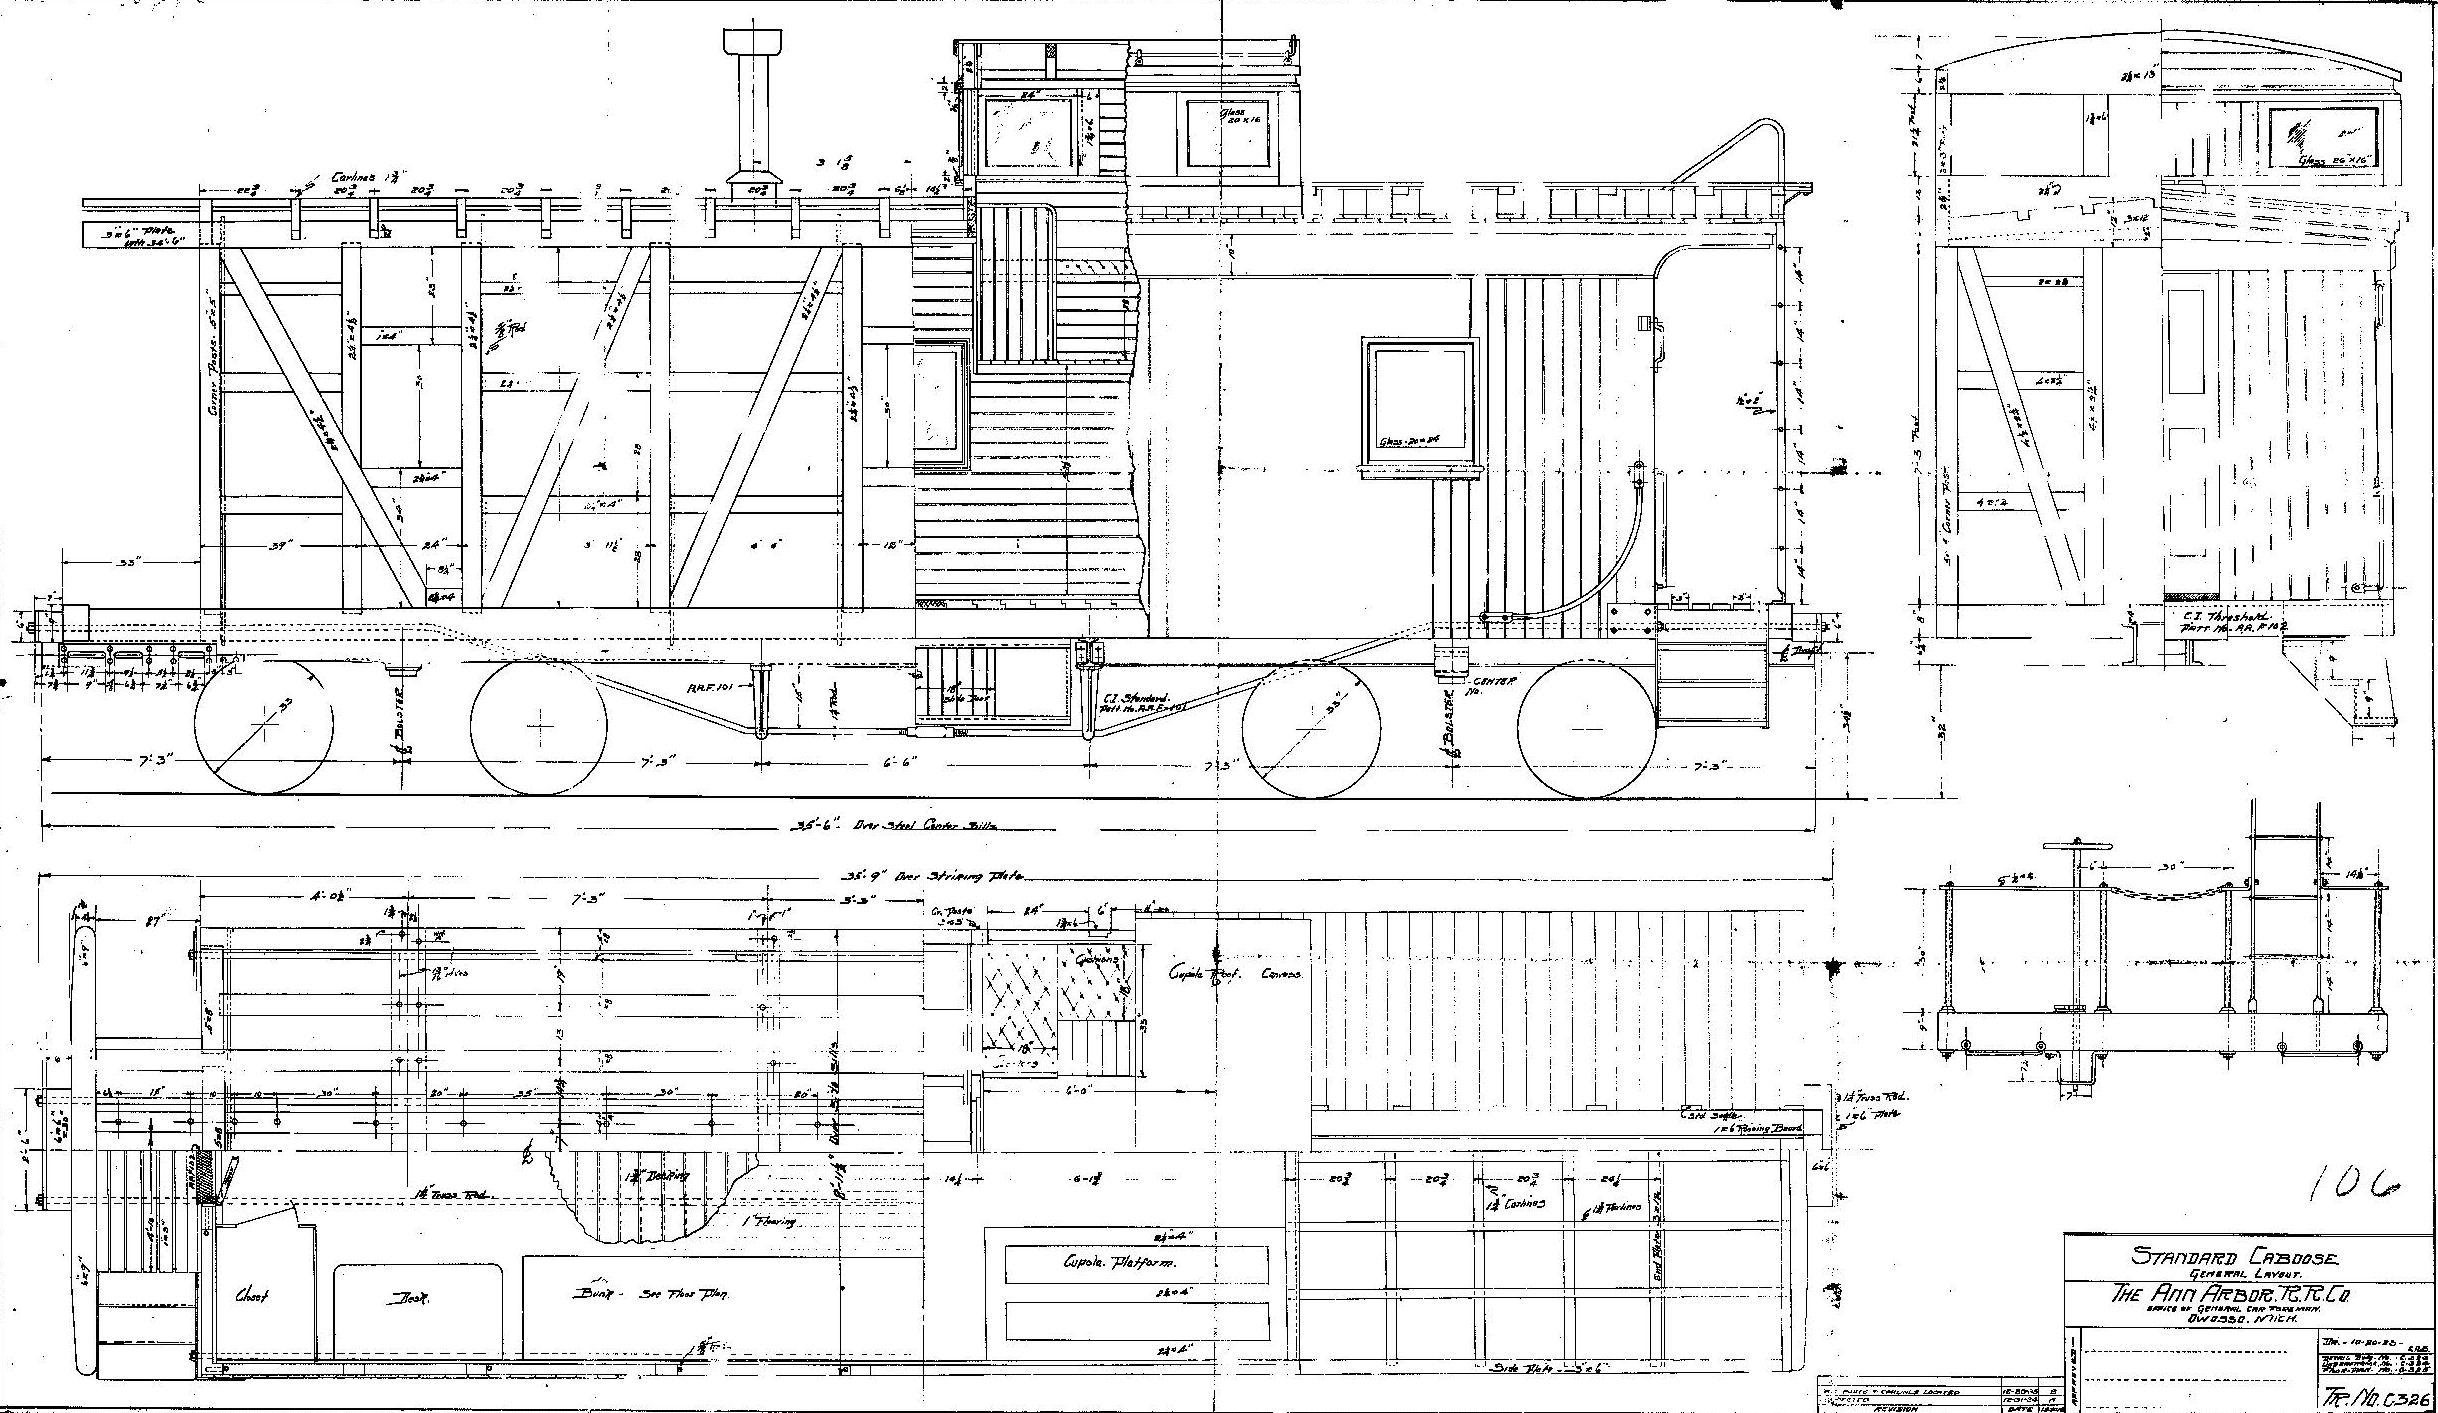 Garage Designs Australia Ann Arbor Blueprints Portable